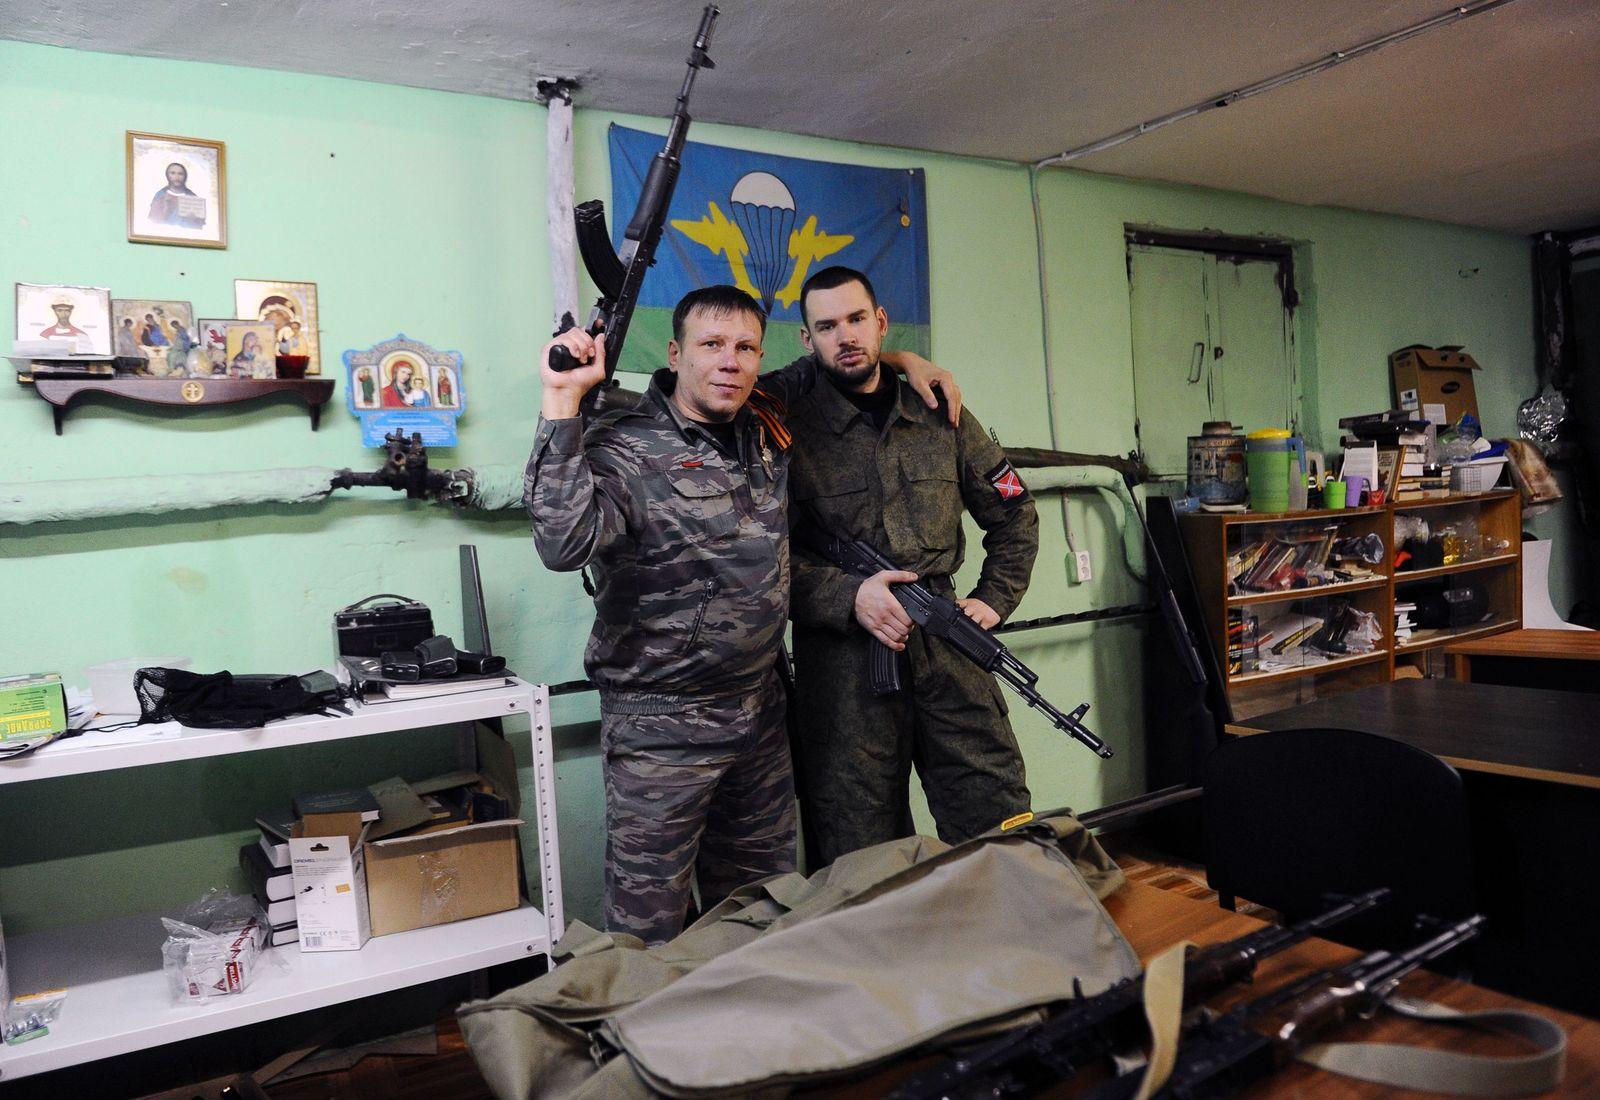 FILES-US-RUSSIA-RACISM-TERRORISM